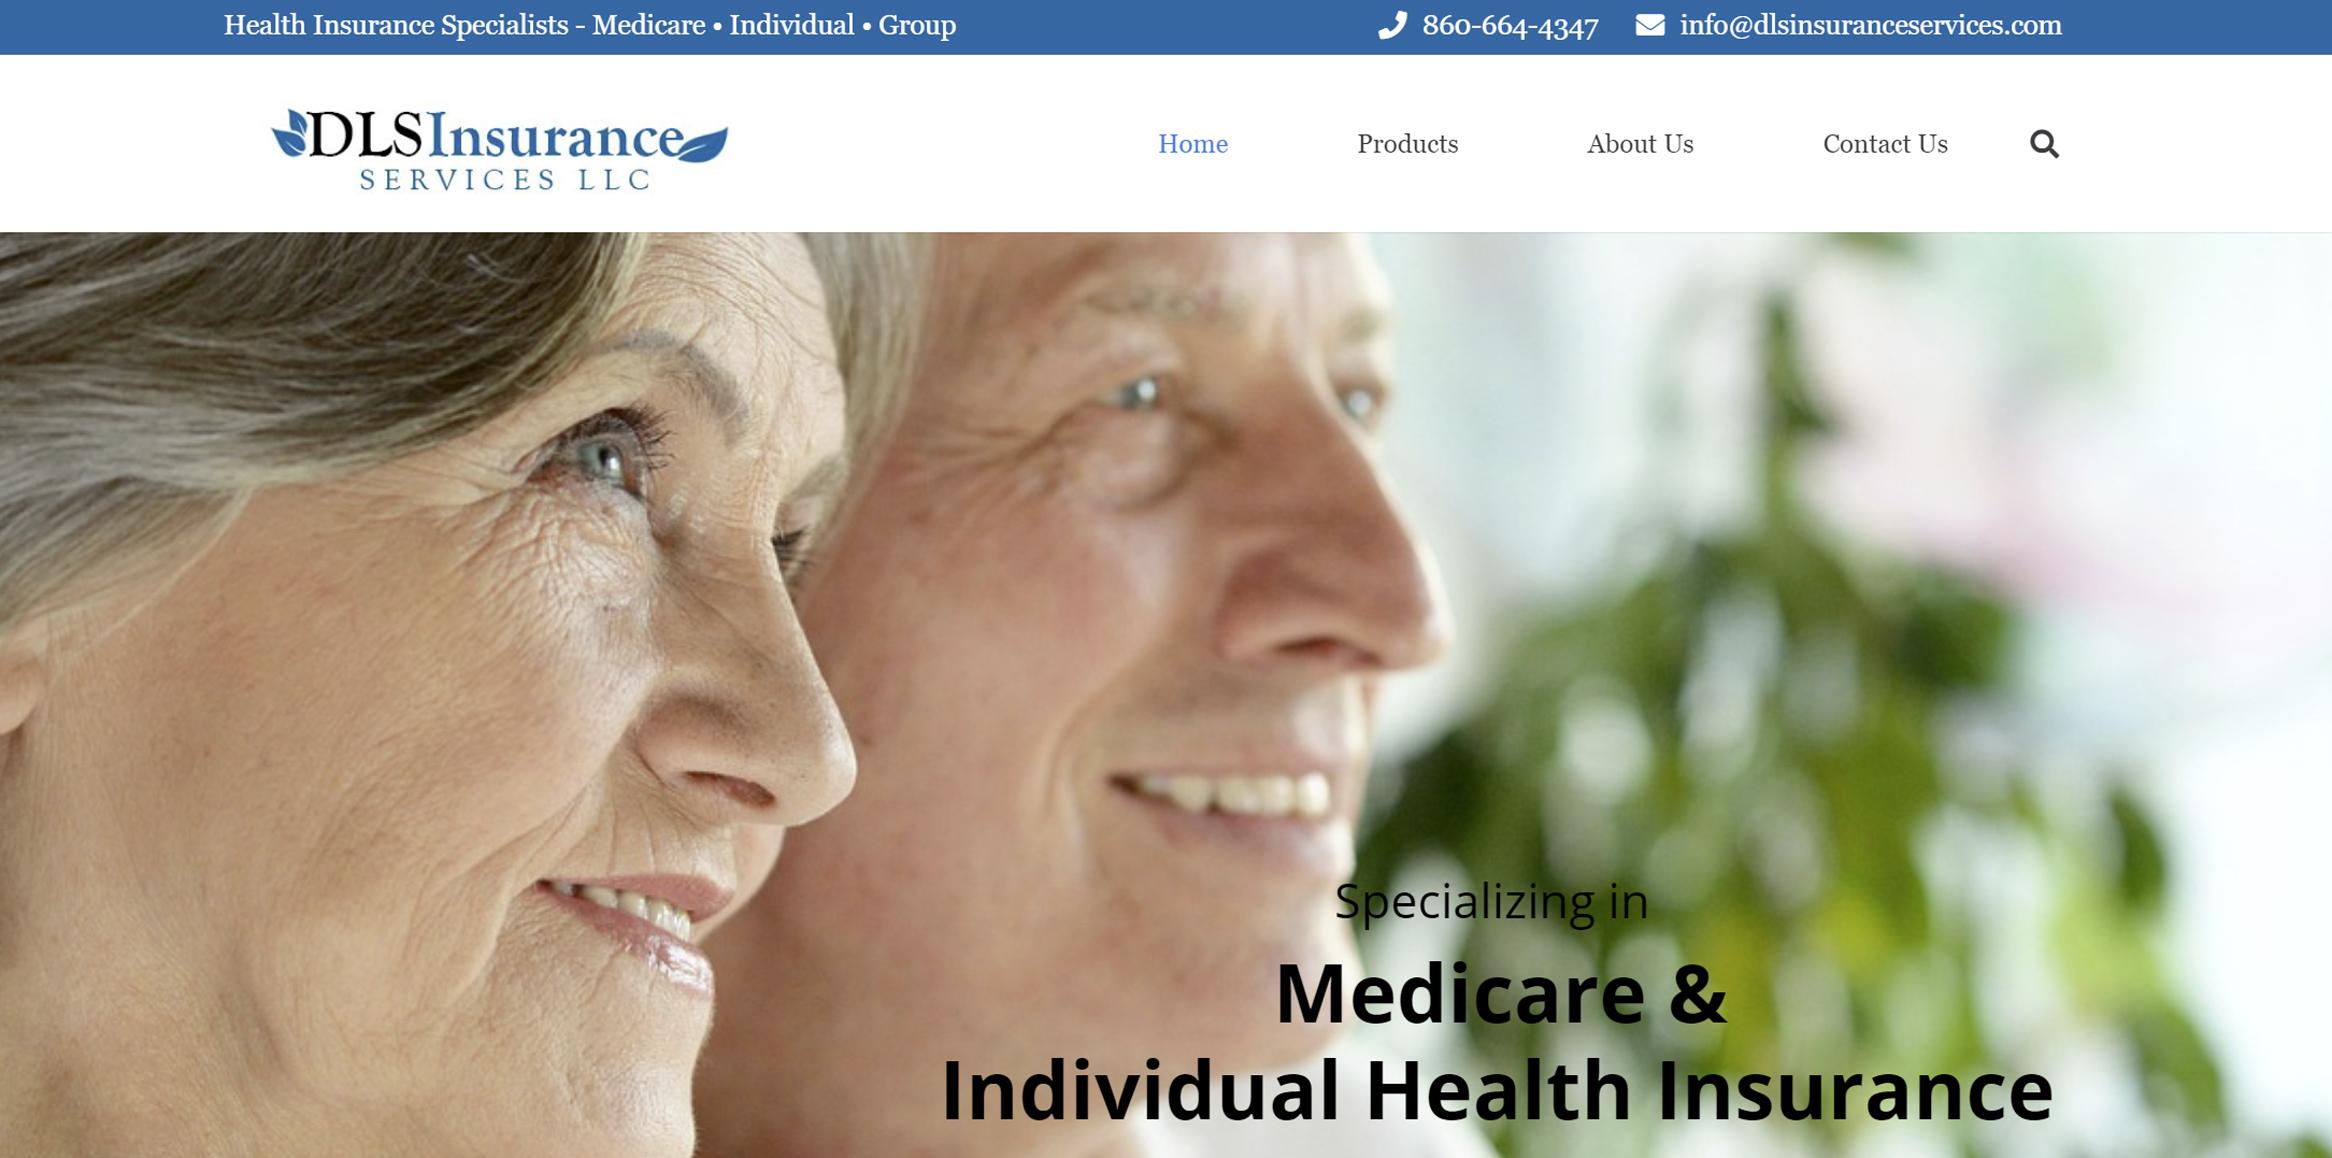 DLS Insurance Services LLC